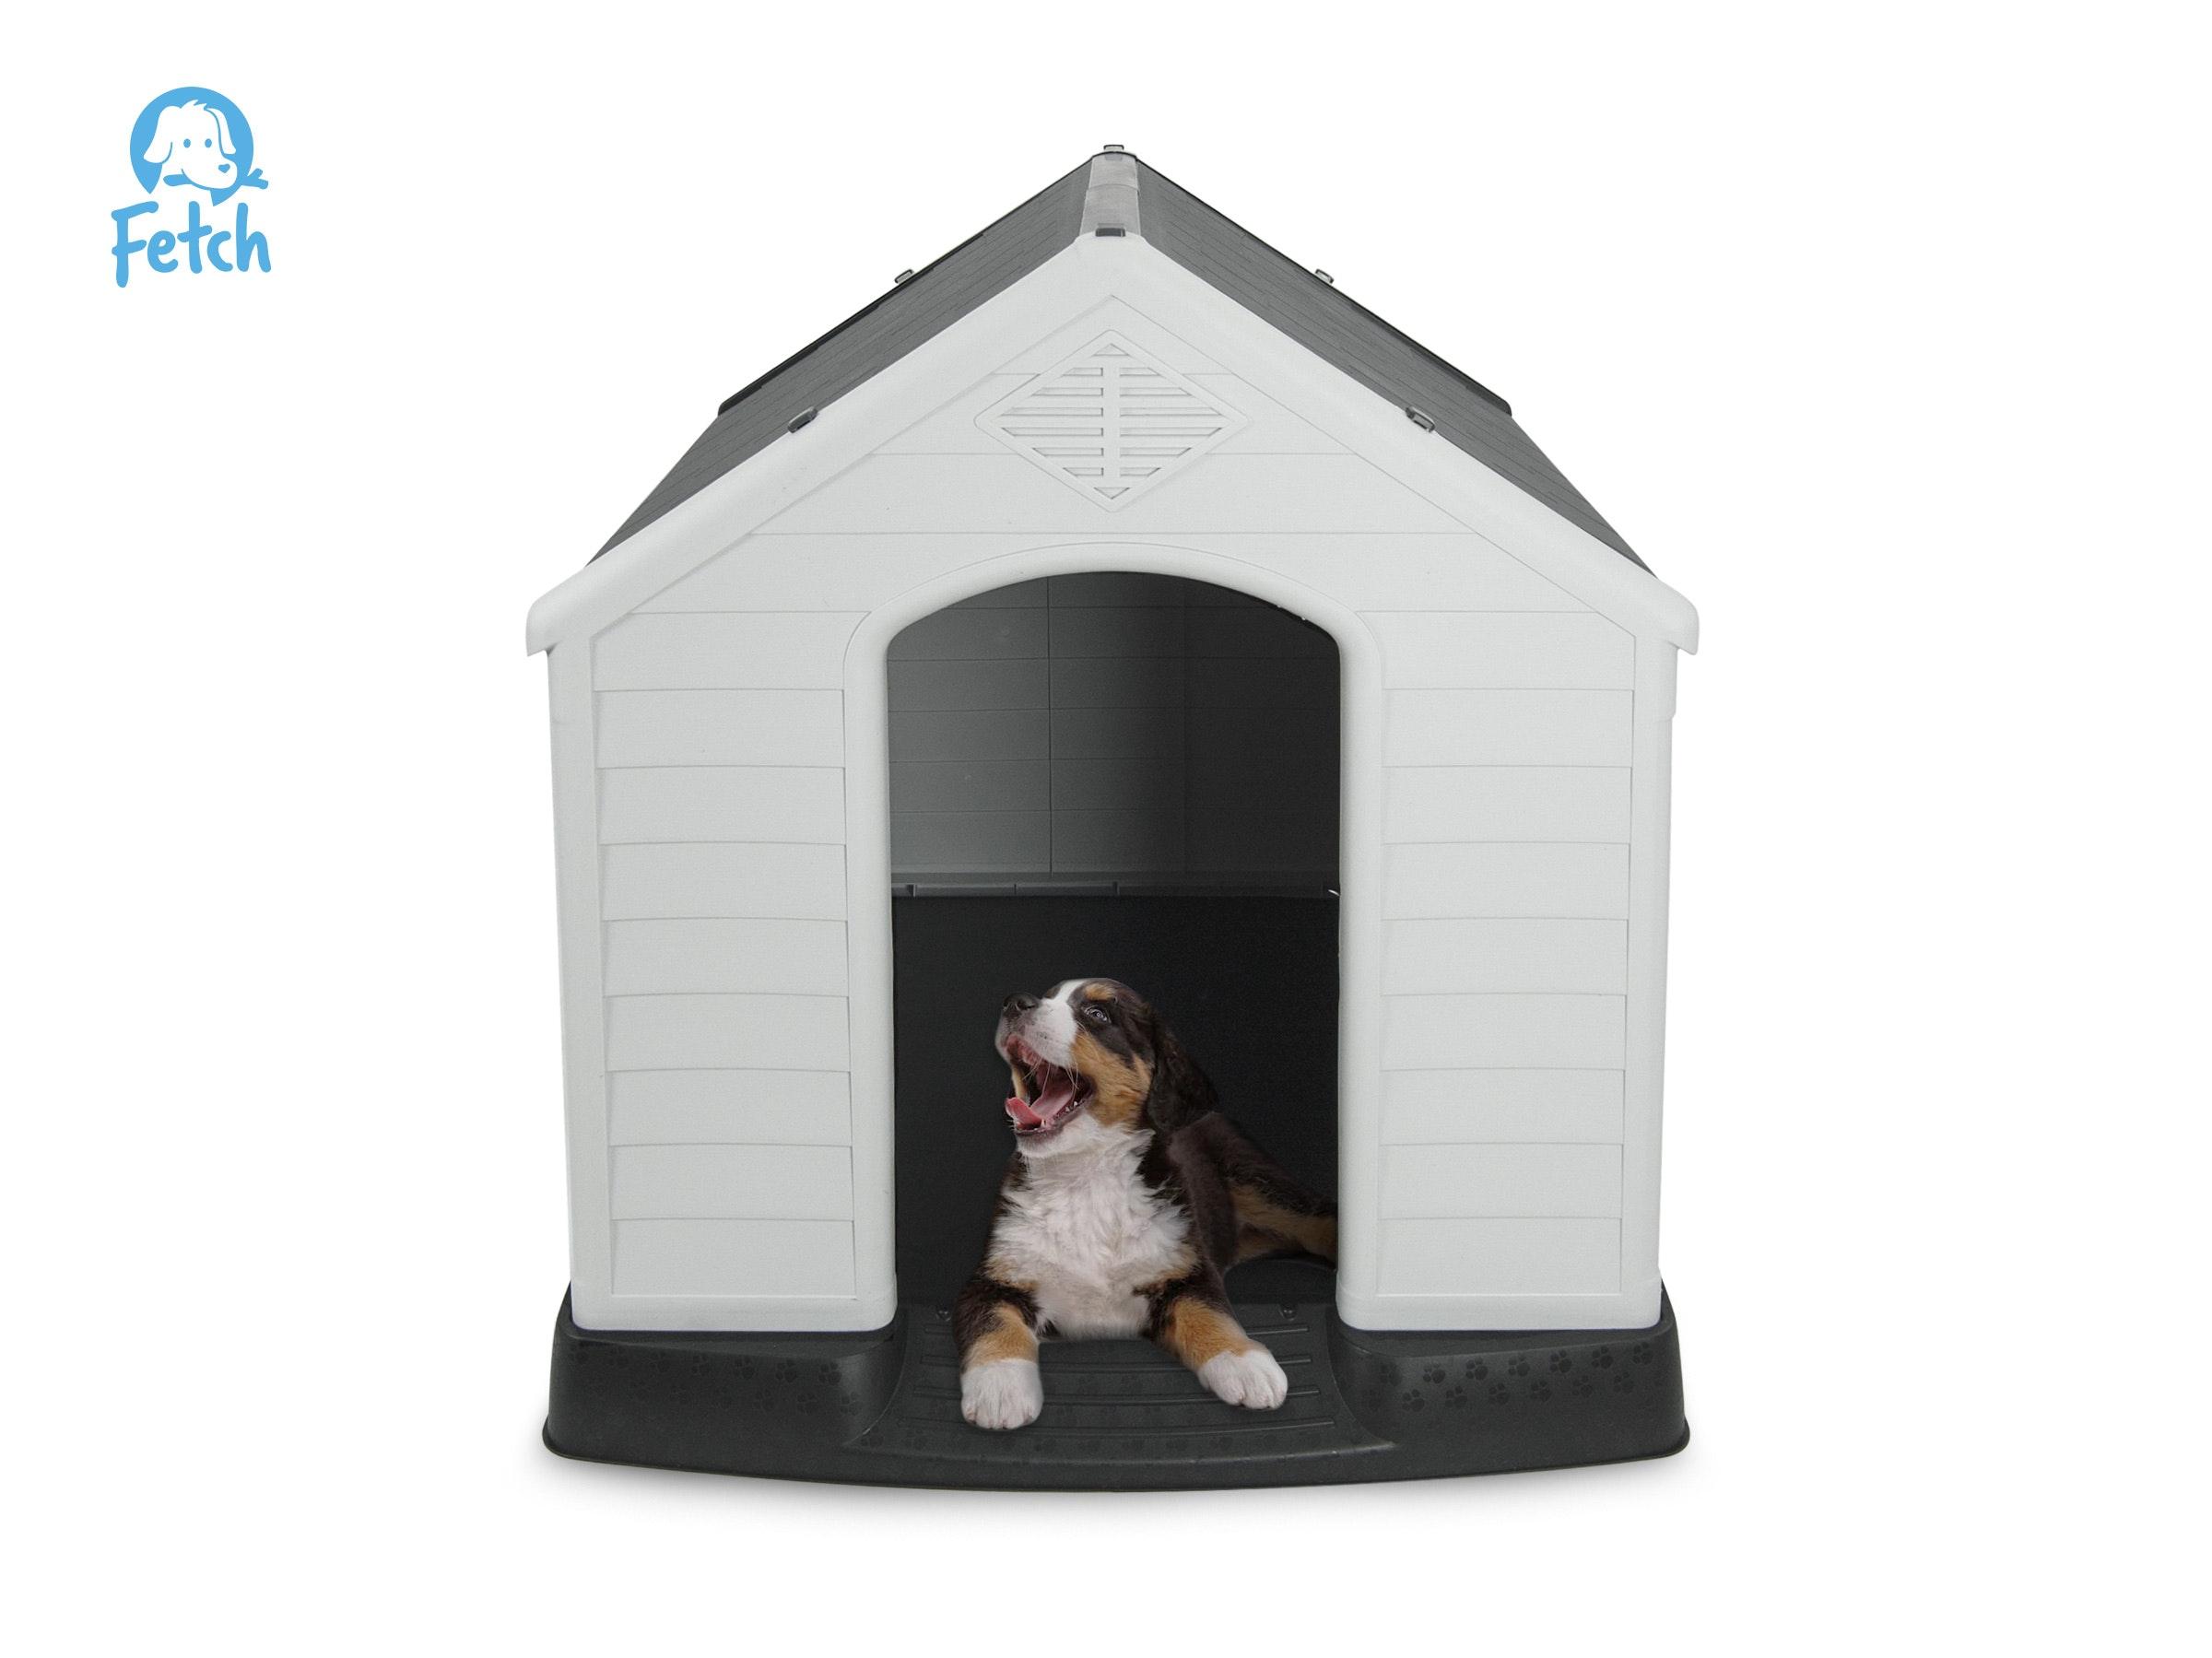 Fetch Dog Kennel Large